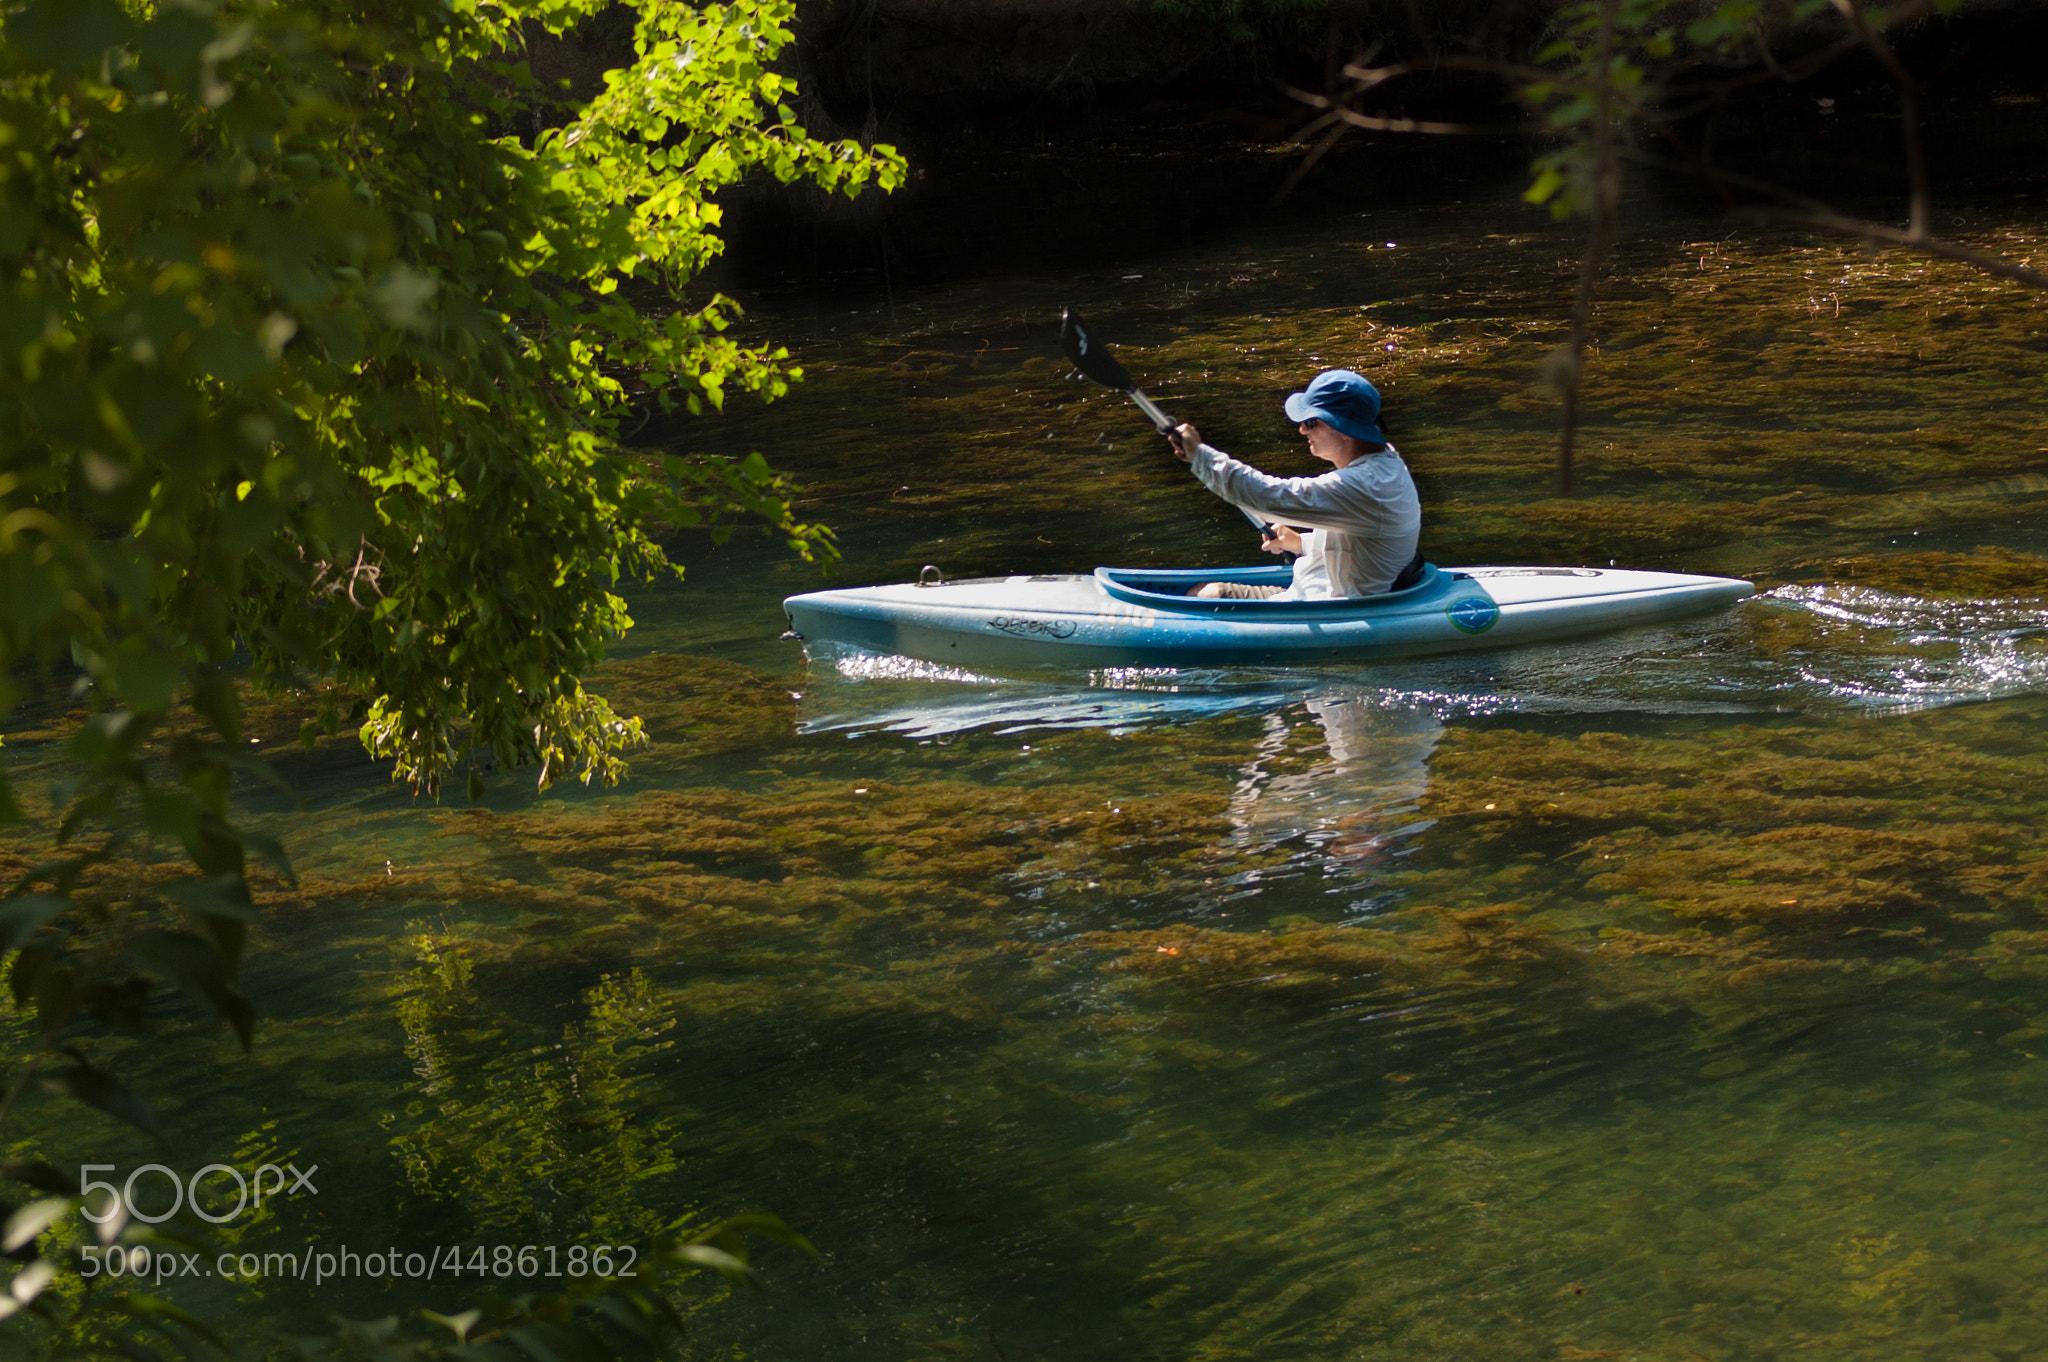 Photograph Canoeing at Barton Creek by Pratik  on 500px